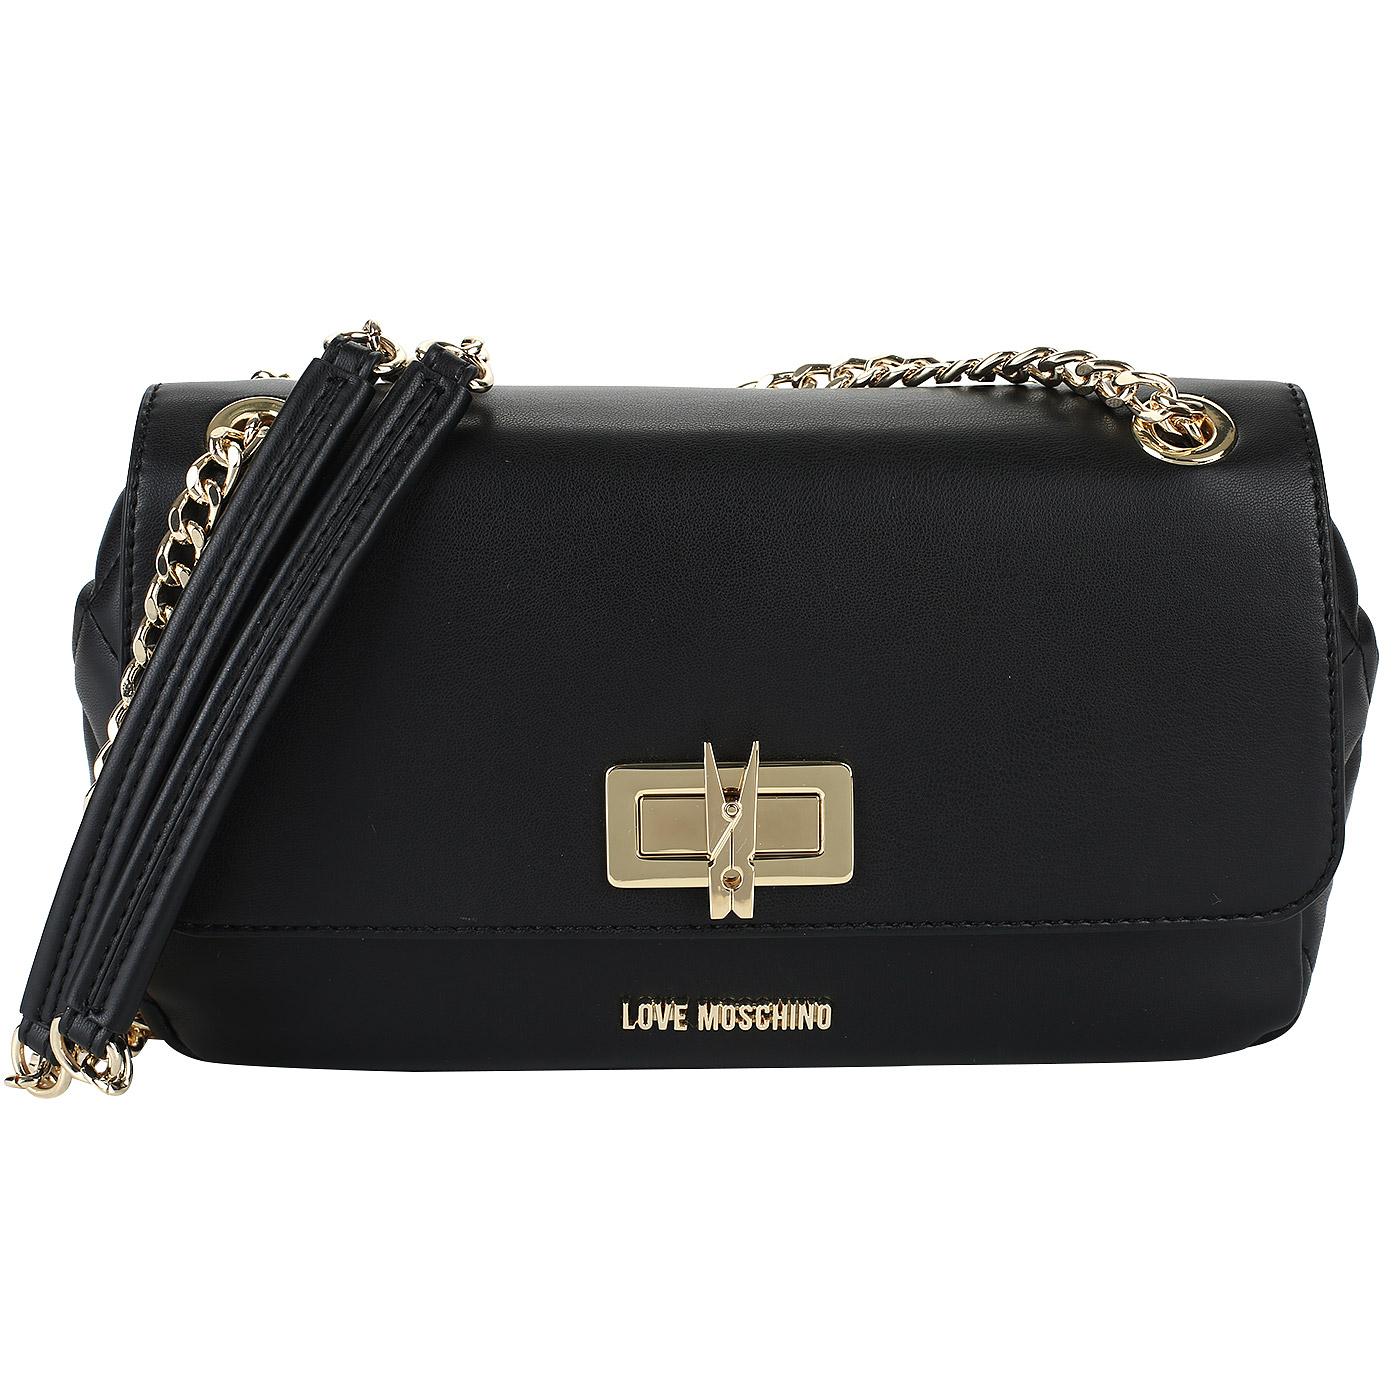 fb85daa4466a ... Черная женская сумочка на плечевой цепочке Love Moschino Fashion  Quilted ...